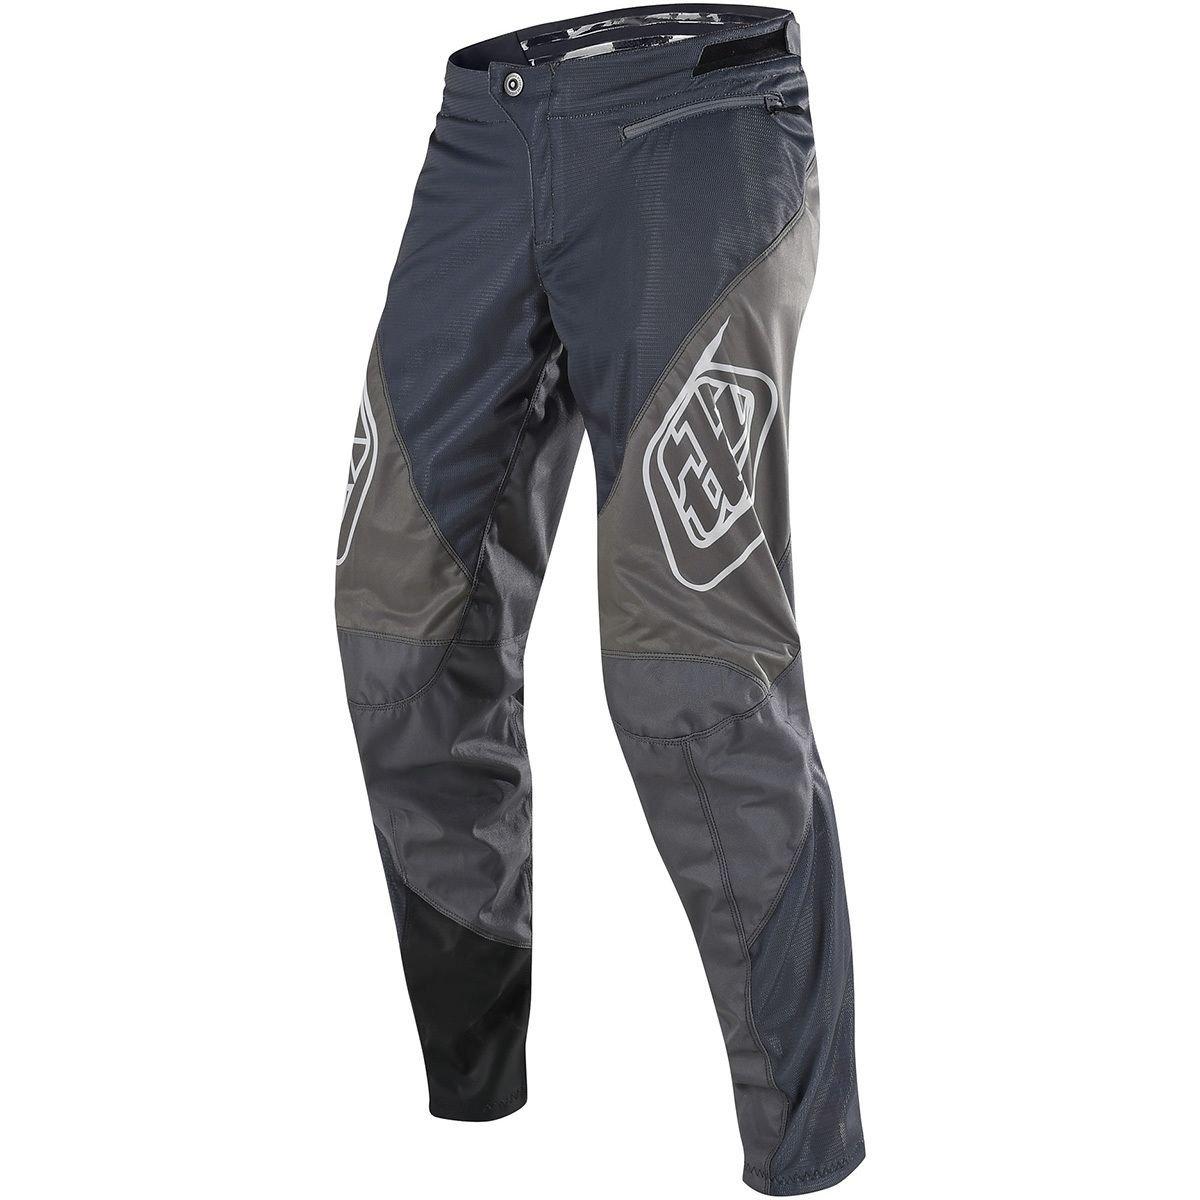 Troy Lee Designs Sprint Mens Bicycle Pants Gray 34 USA